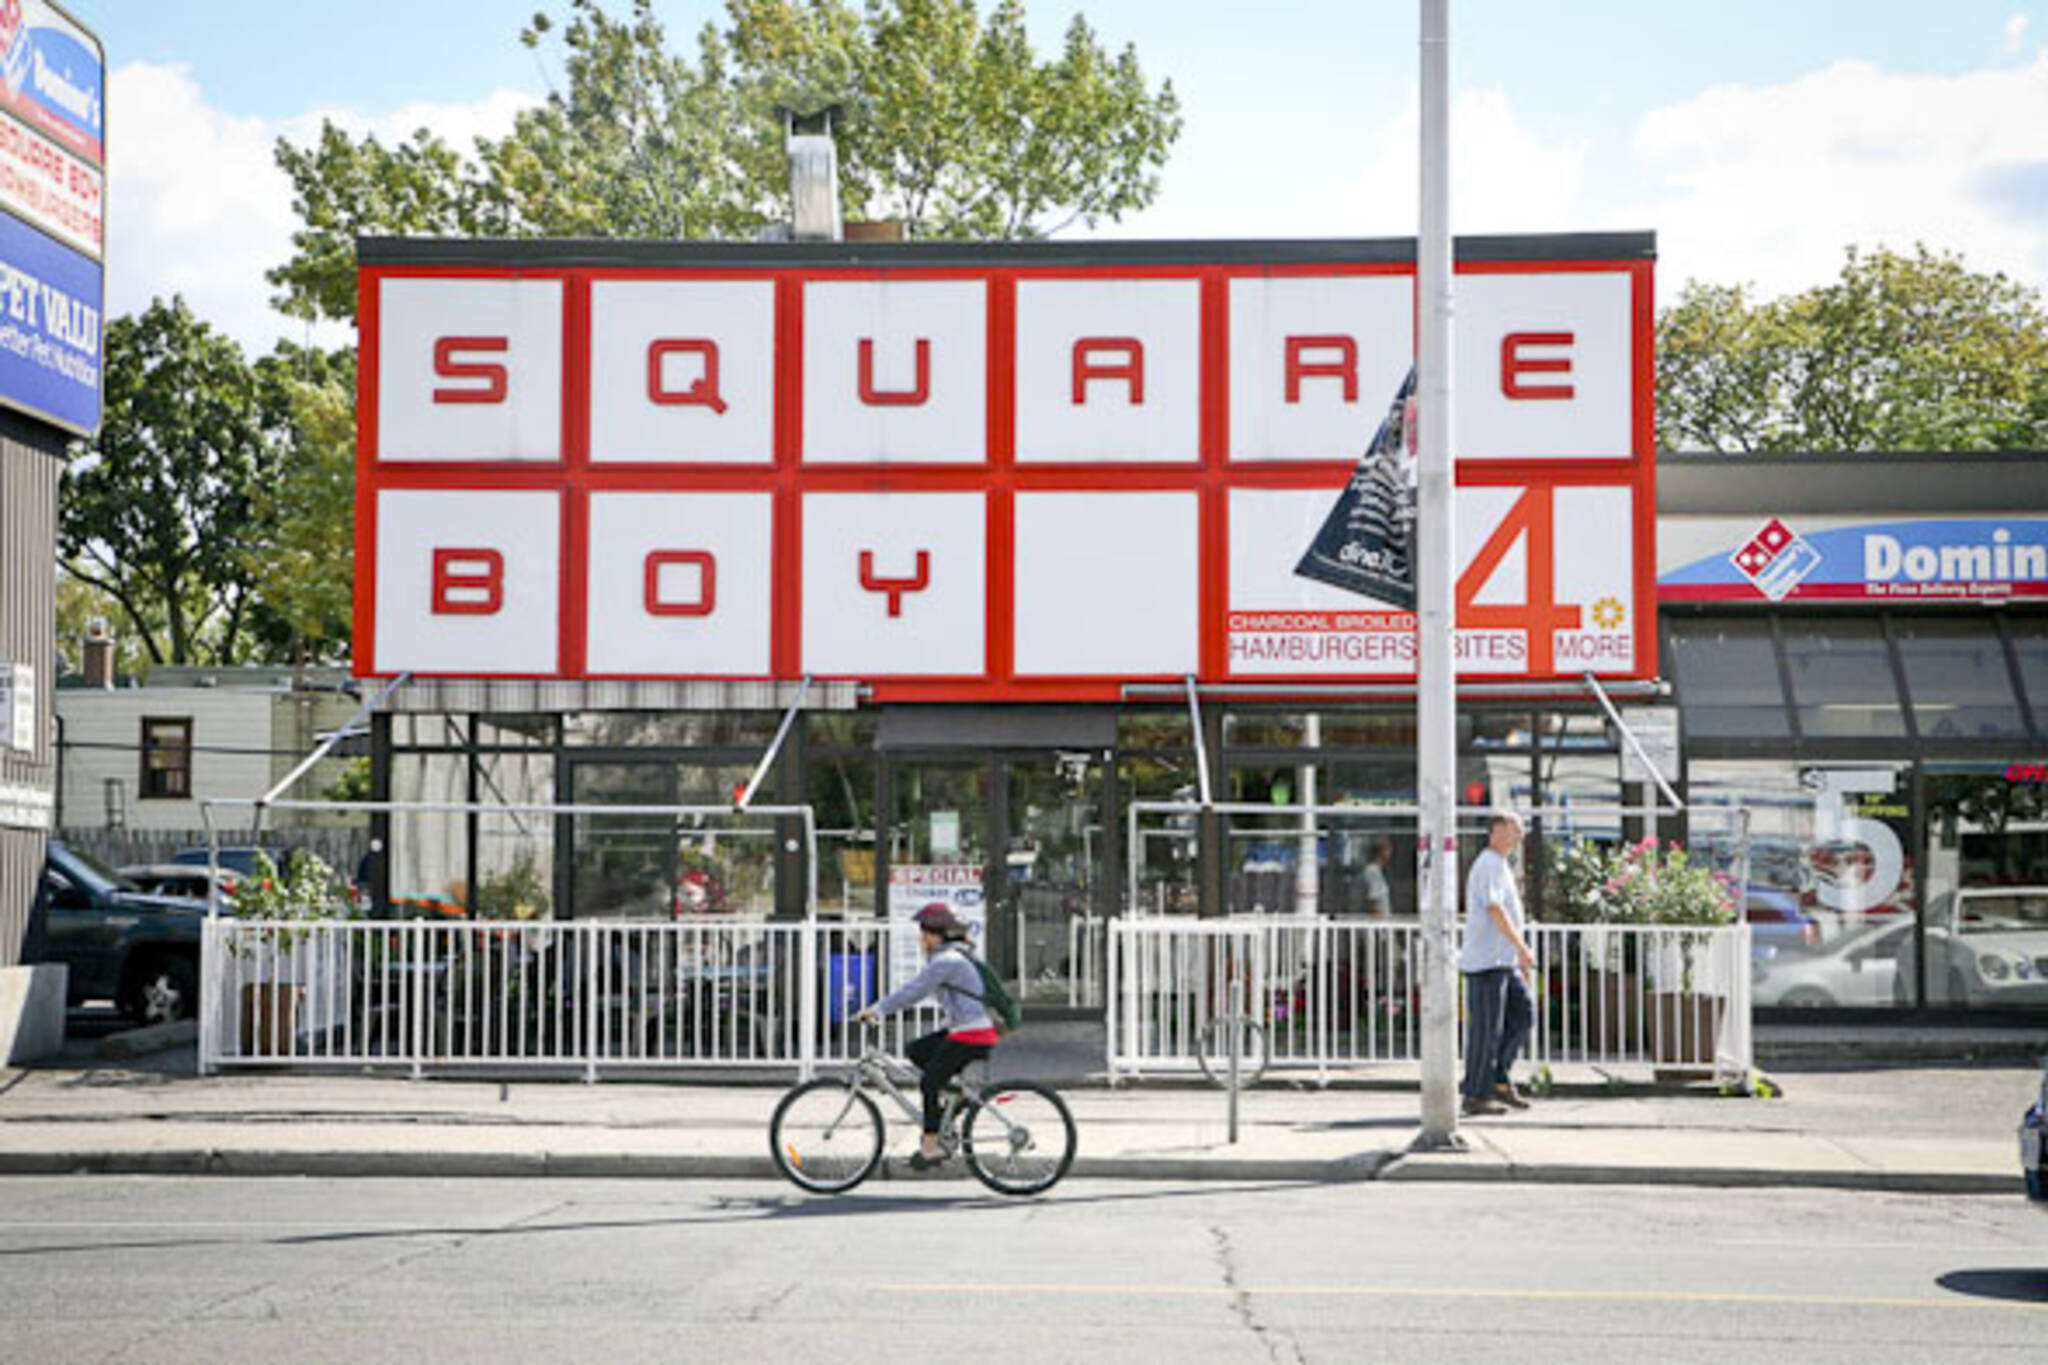 Square Boy Toronto